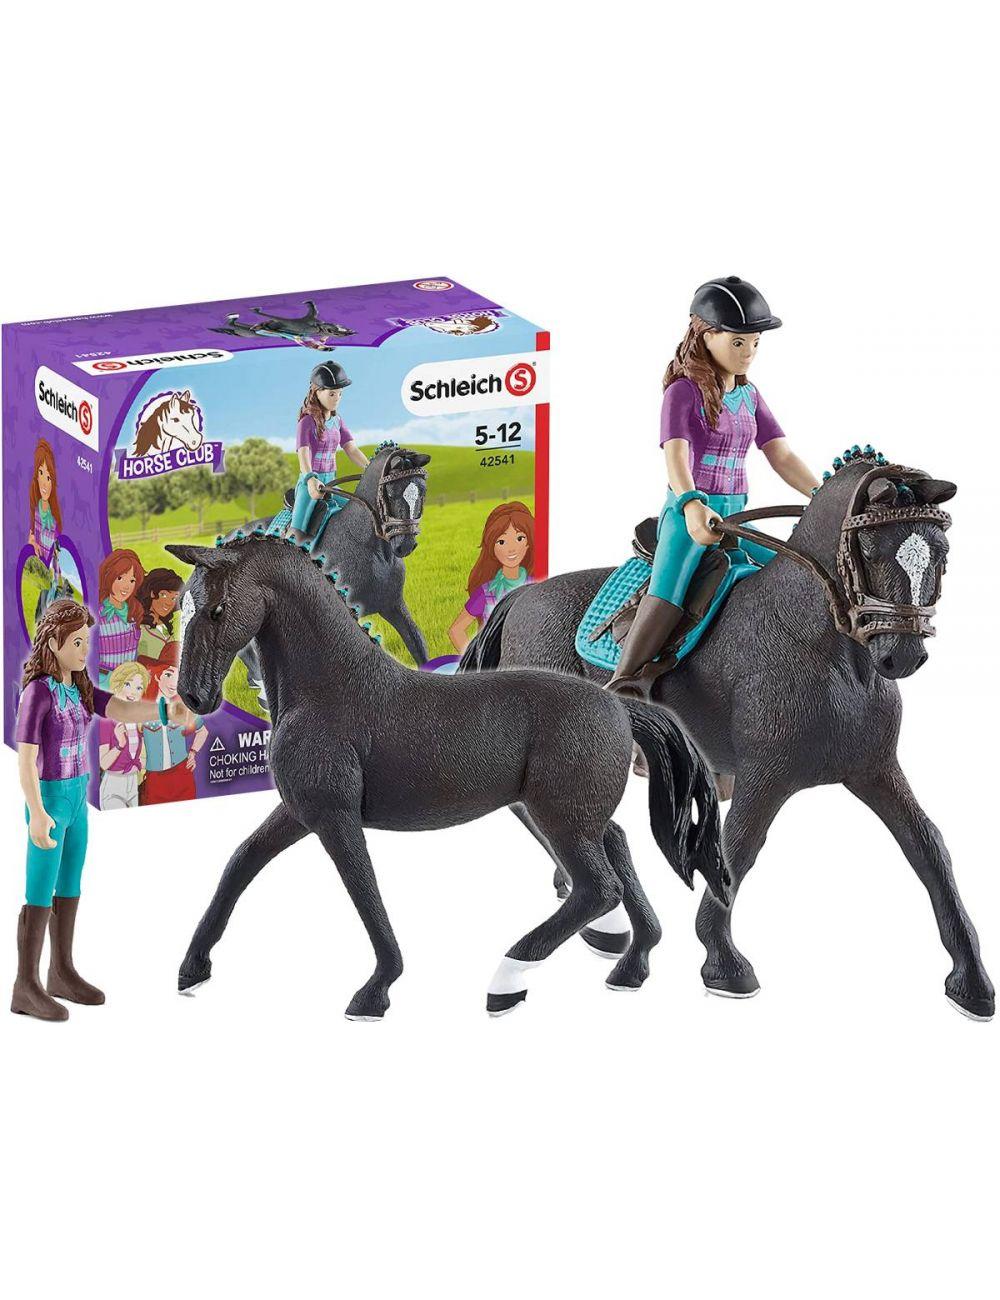 Schleich 42541 Lisa & Storm Horse Club Jeździec Koń Figurka